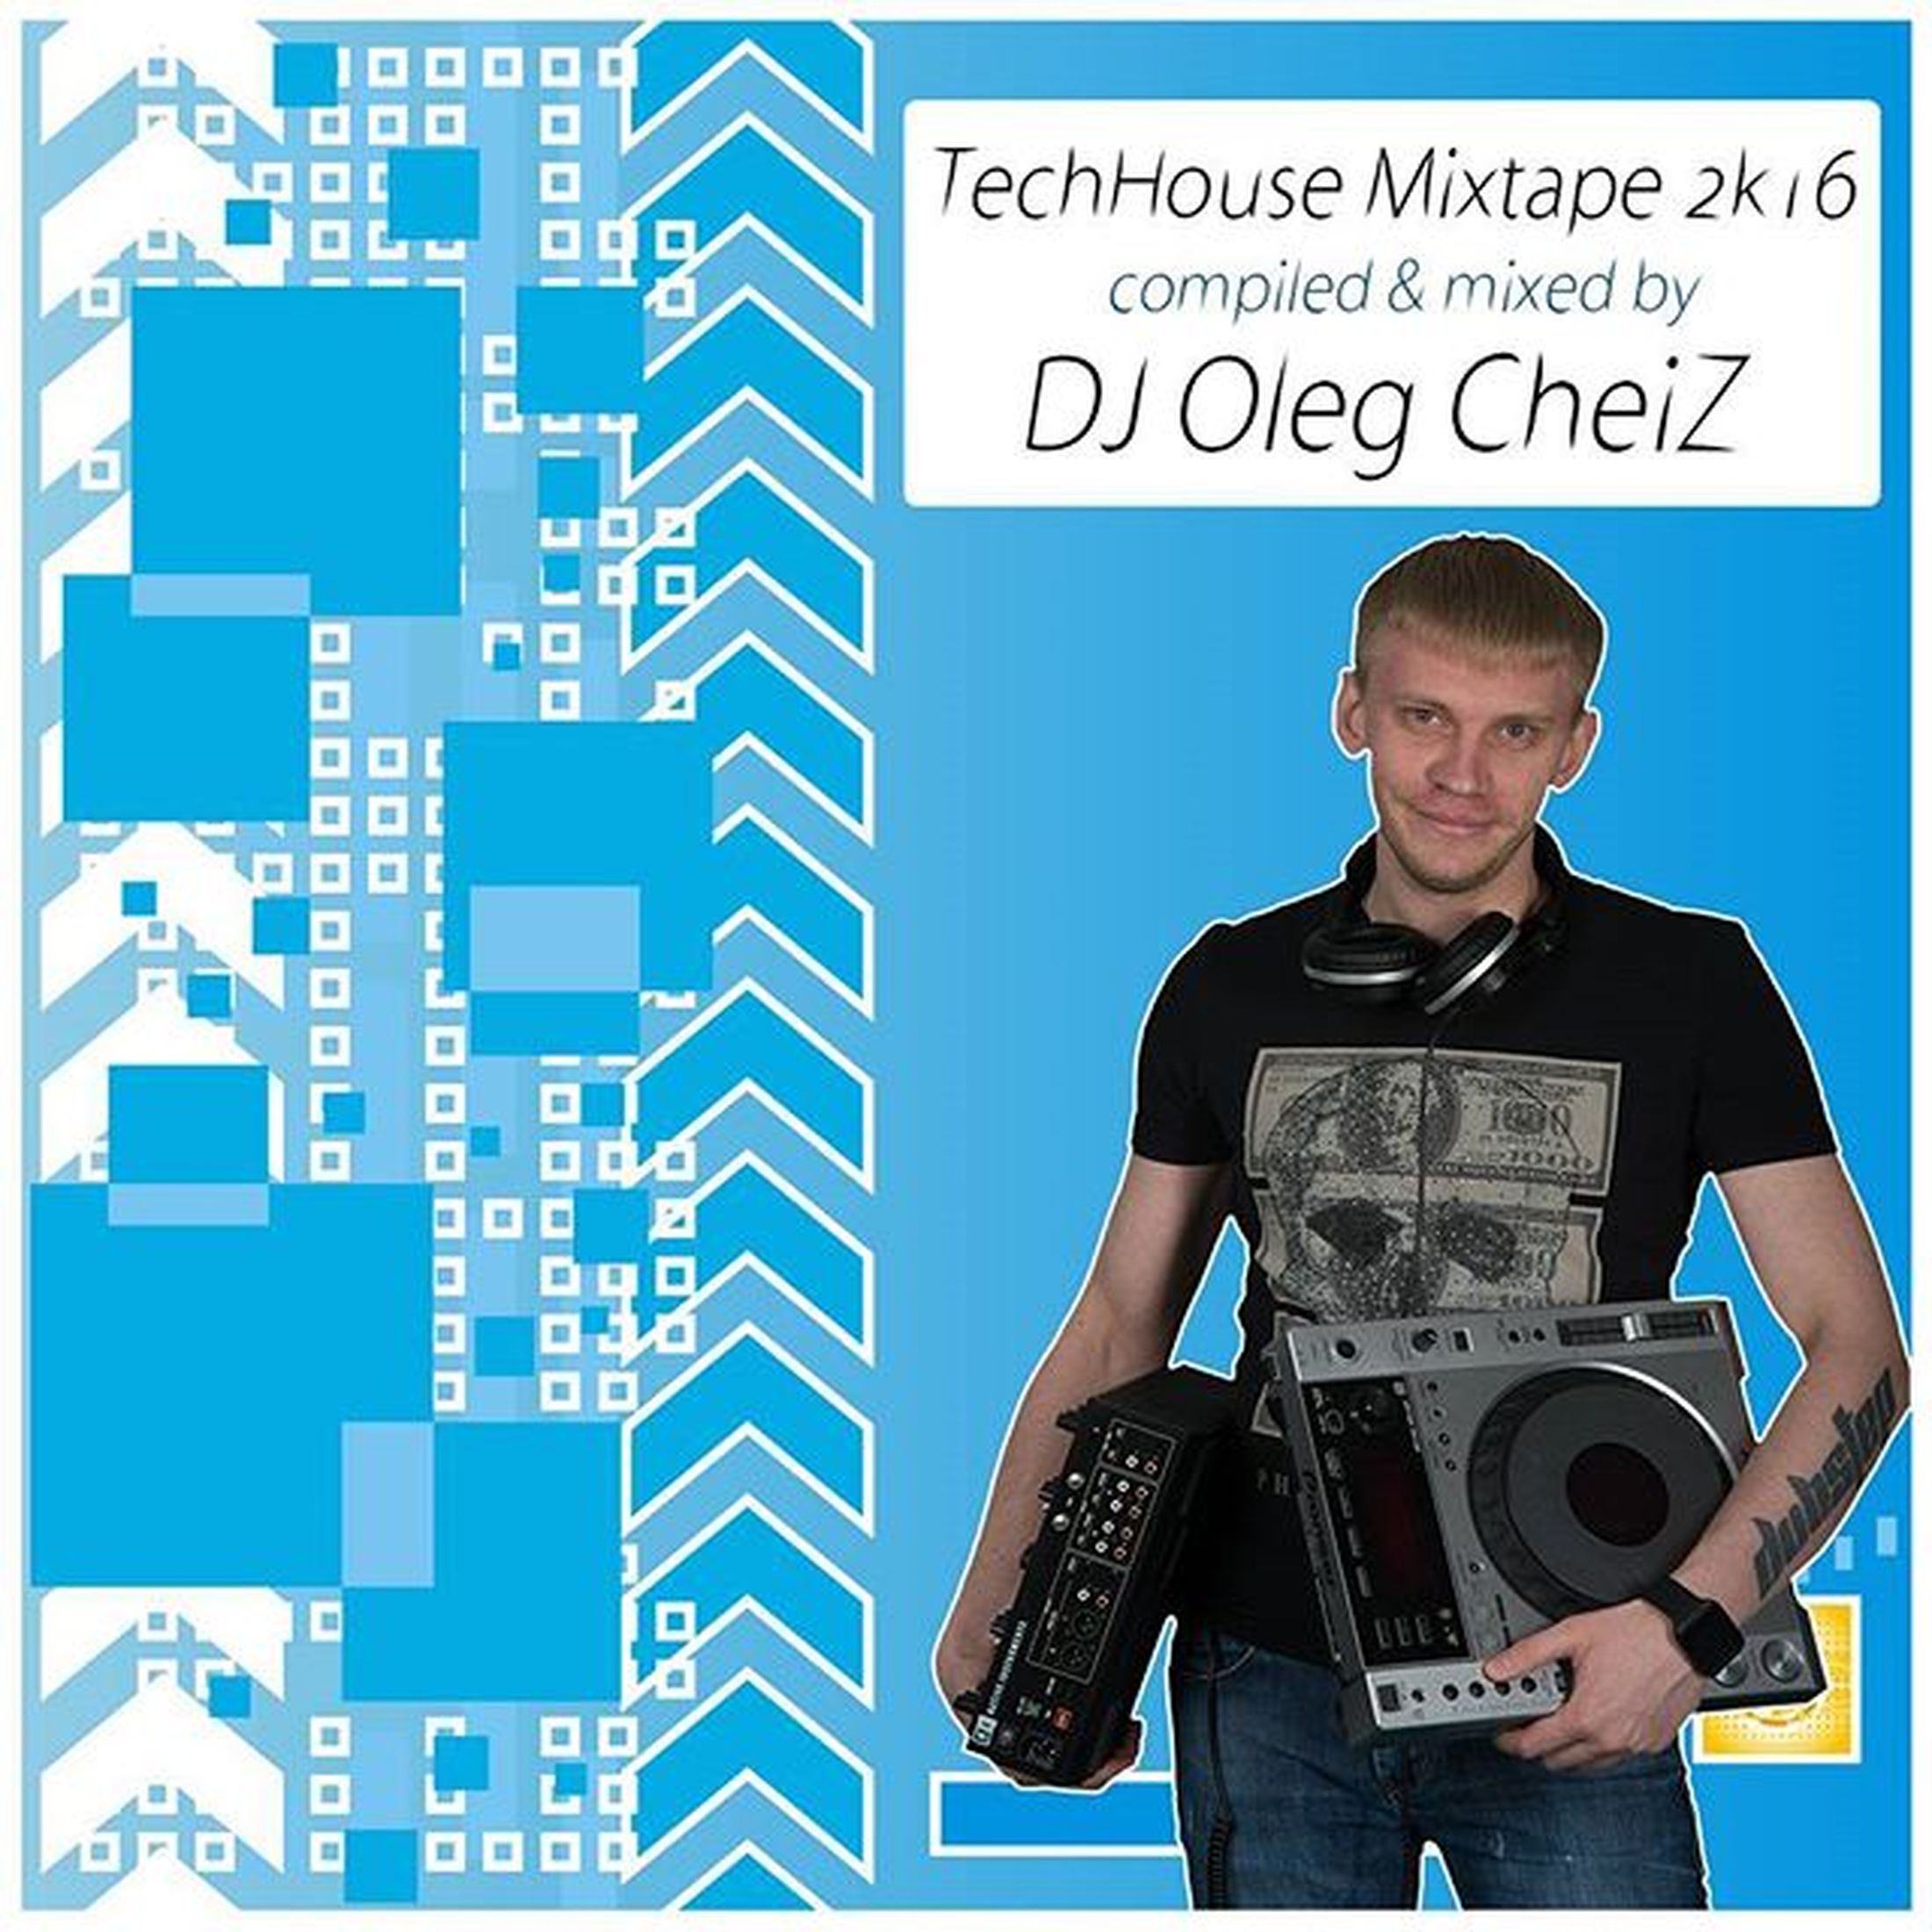 Очередная подборочка треков, в новом Techhouse миксе, от меня! 😉 Найти как обычно можете здесь: http://pdj.cc/fnYvl и http://showbiza.com/olegcheiz/audio/157617 ✔ Listen & Enjoy 🎭 Треклист: 01) Skymate - Commitment (Original Mix) / [Spliced Vinyl Recordings] 02) Javi Colors - Stompin' (Original Mix) / [Stereo Productions] 03) Ed Kurno - Funked Phenomena (Original Mix) / [Kurno Kutz Records] 04) Marcelo Cura - Onenone (Arado remix) / [Sanity Records] 05) Florian Kruse feat. Hendrik Burkhard - Broken Mirror (Original Mix) / [Jeudi Records] 06) Audiojack - Robot (10 Year Reincarnation) / [Leftroom Records] 07) Rok Tomic - Egotrip (Original Mix) / [MoonShake Records] 08) Skymate - My Life (Original Mix) / [Donkeyhead Recordings] 09) Mark Grandel & Peter Mayzer - Psyhical Ghost (Original Mix) / [Puzzle Music Records] 10) Mendo - Don't Hold Back (Chus & Ceballos remix) / [Toolroom Trax] 11) Ale Castro - Shhh In The After Party (Original Mix) / [1994 Music] 12) Rok Tomic - Boca (Original Mix) / [MoonShake Records] 13) JC Davenport - Do It All Night (Original Mix) / [Audio Safari] Newmixtape Techhouse House Techno Music Dance ListenMySound Djolegcheiz 🔊